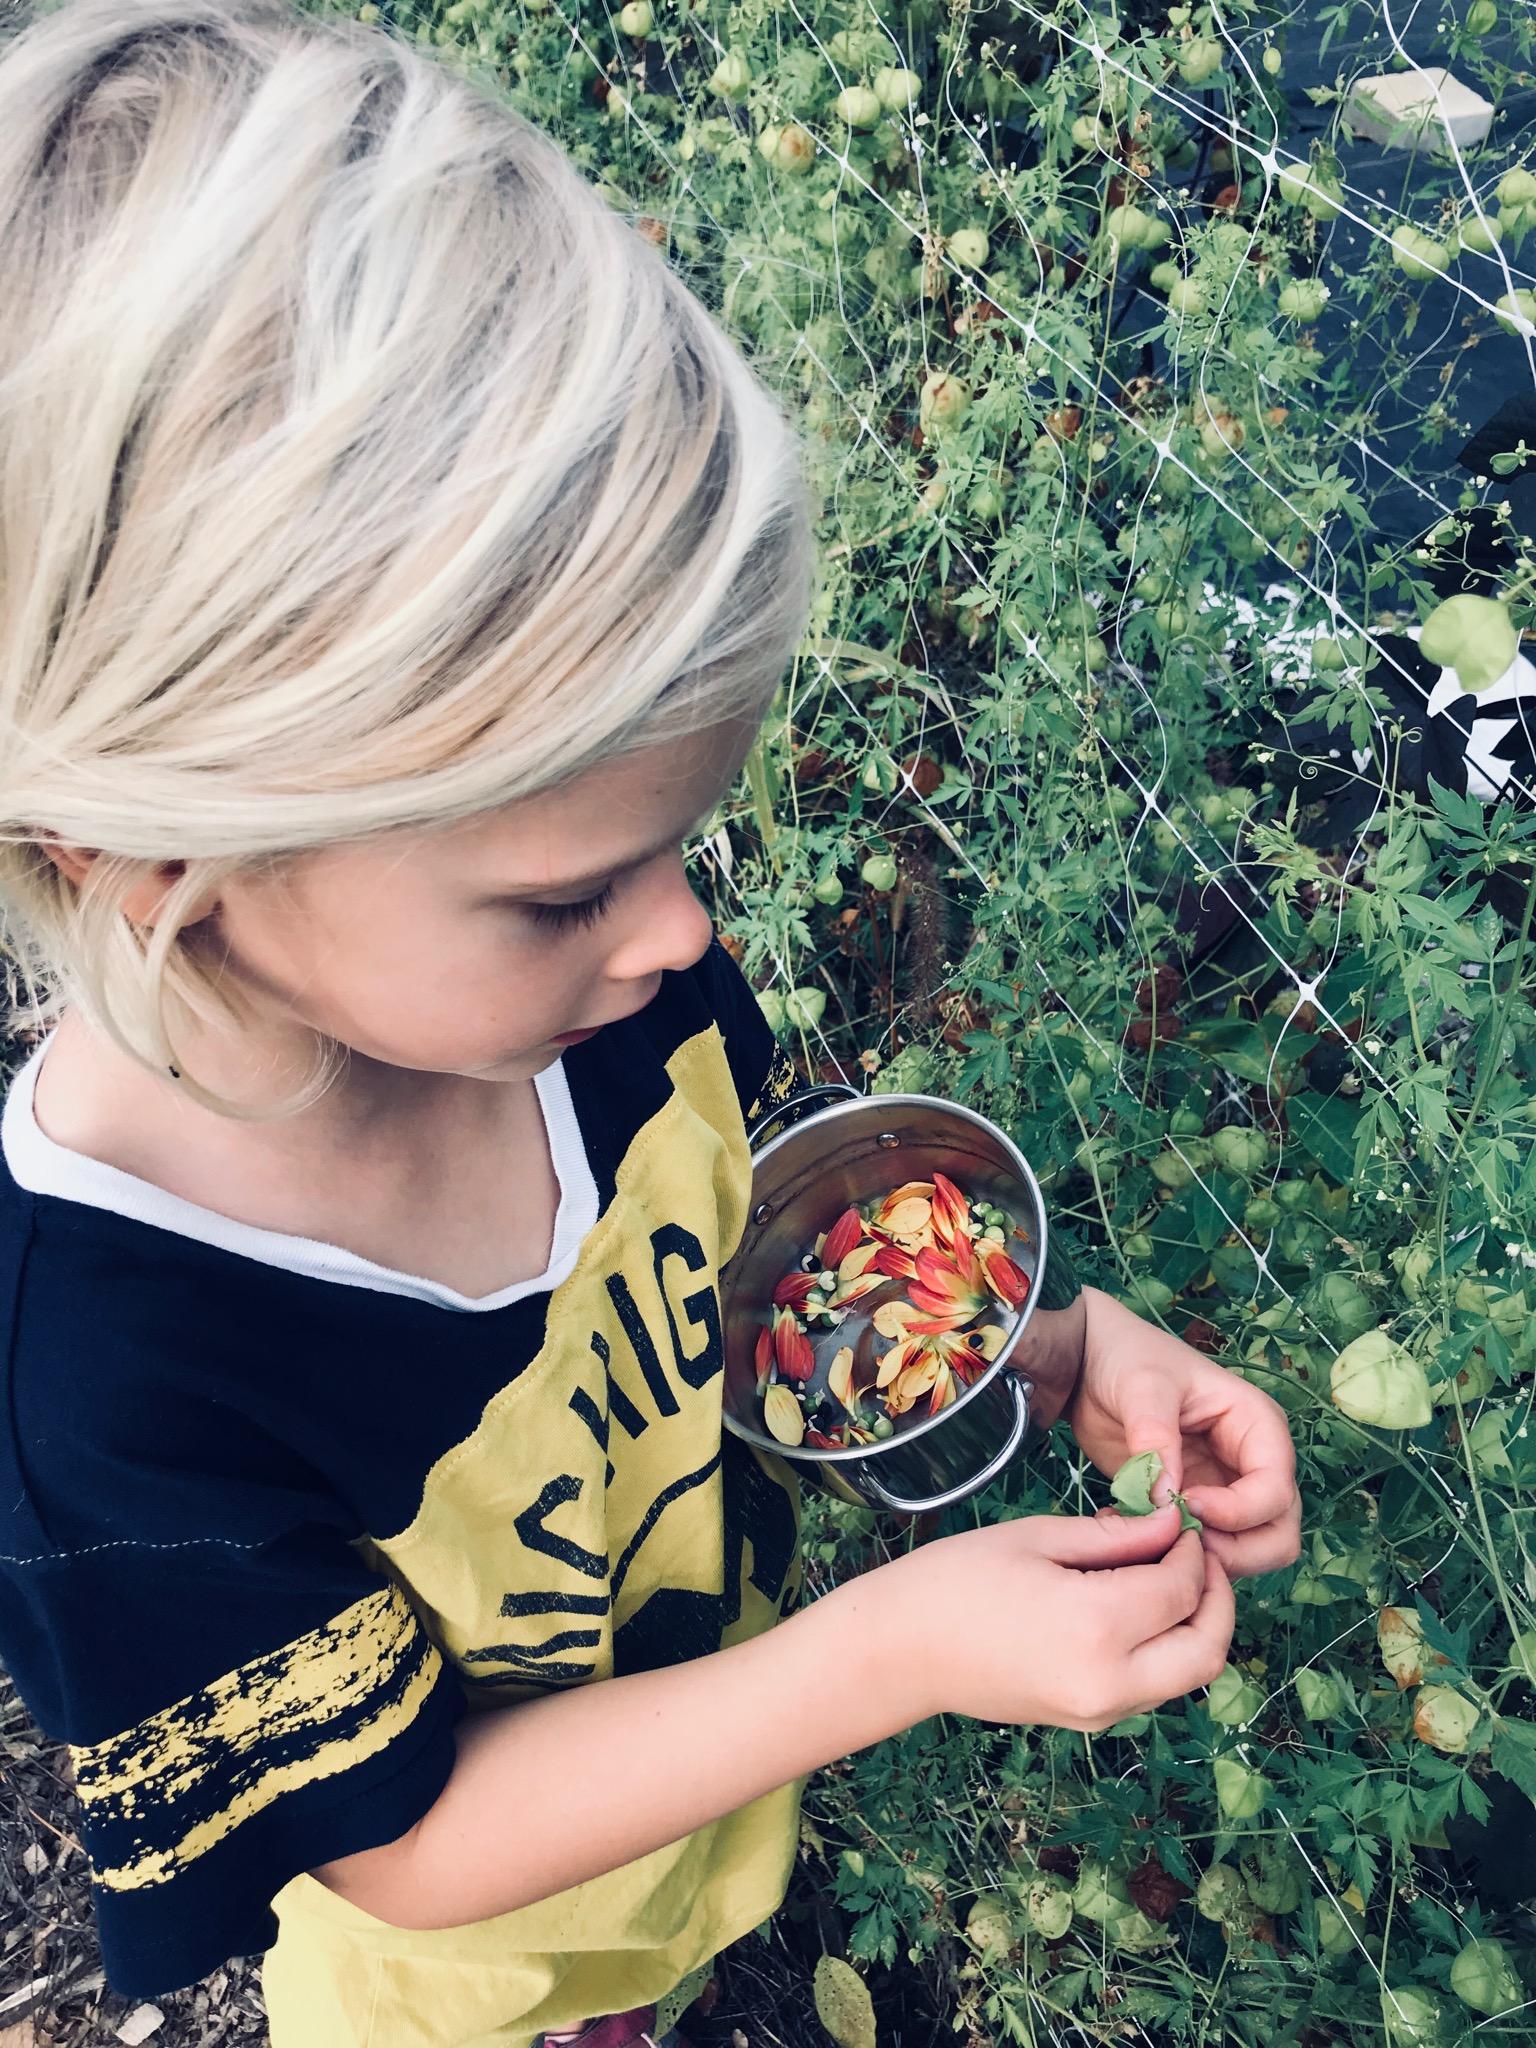 Teagan creating a 'salad'